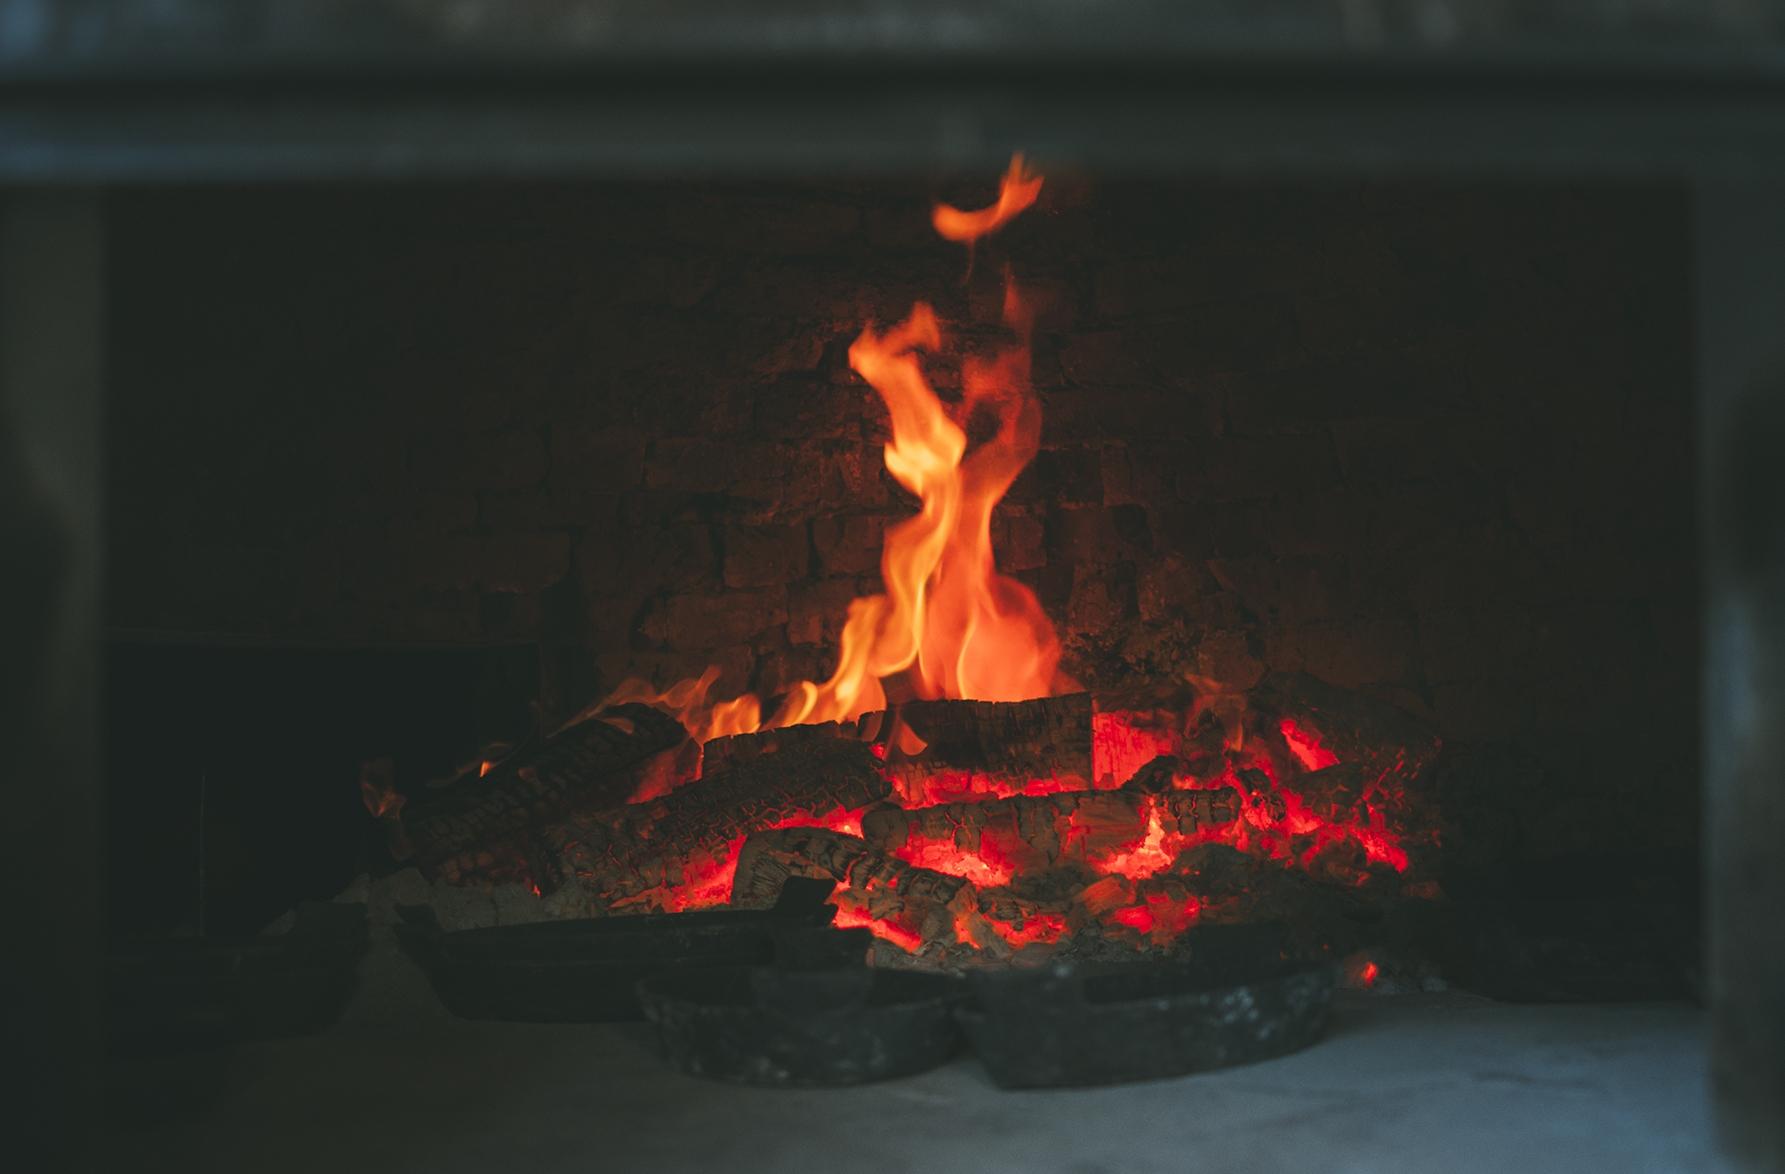 Wood Oven asado argentina